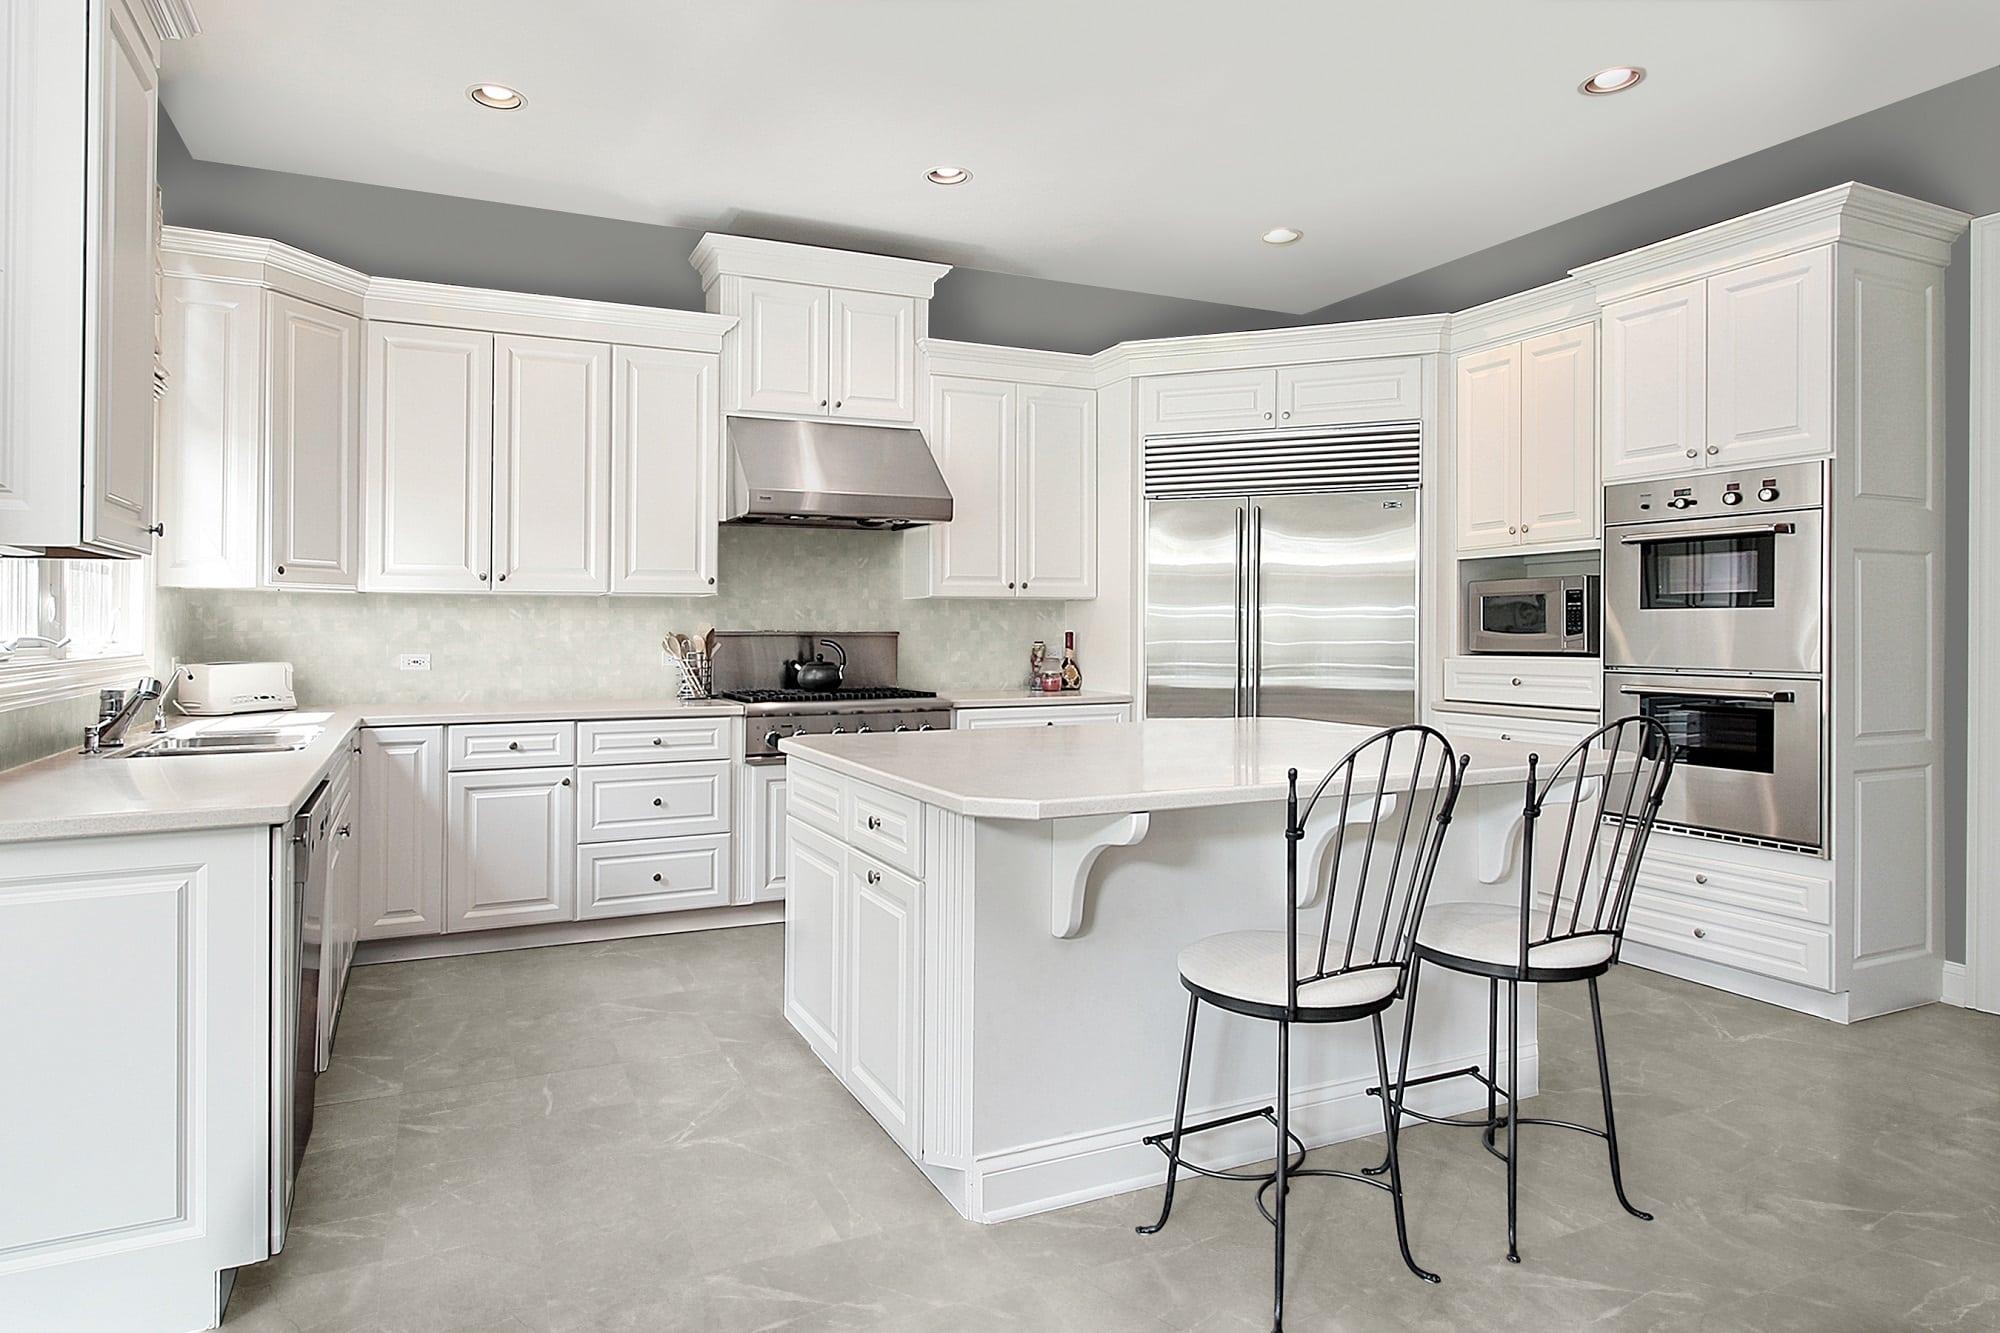 Kitchen, Bathroom Remodeling & Design in Chantilly VA